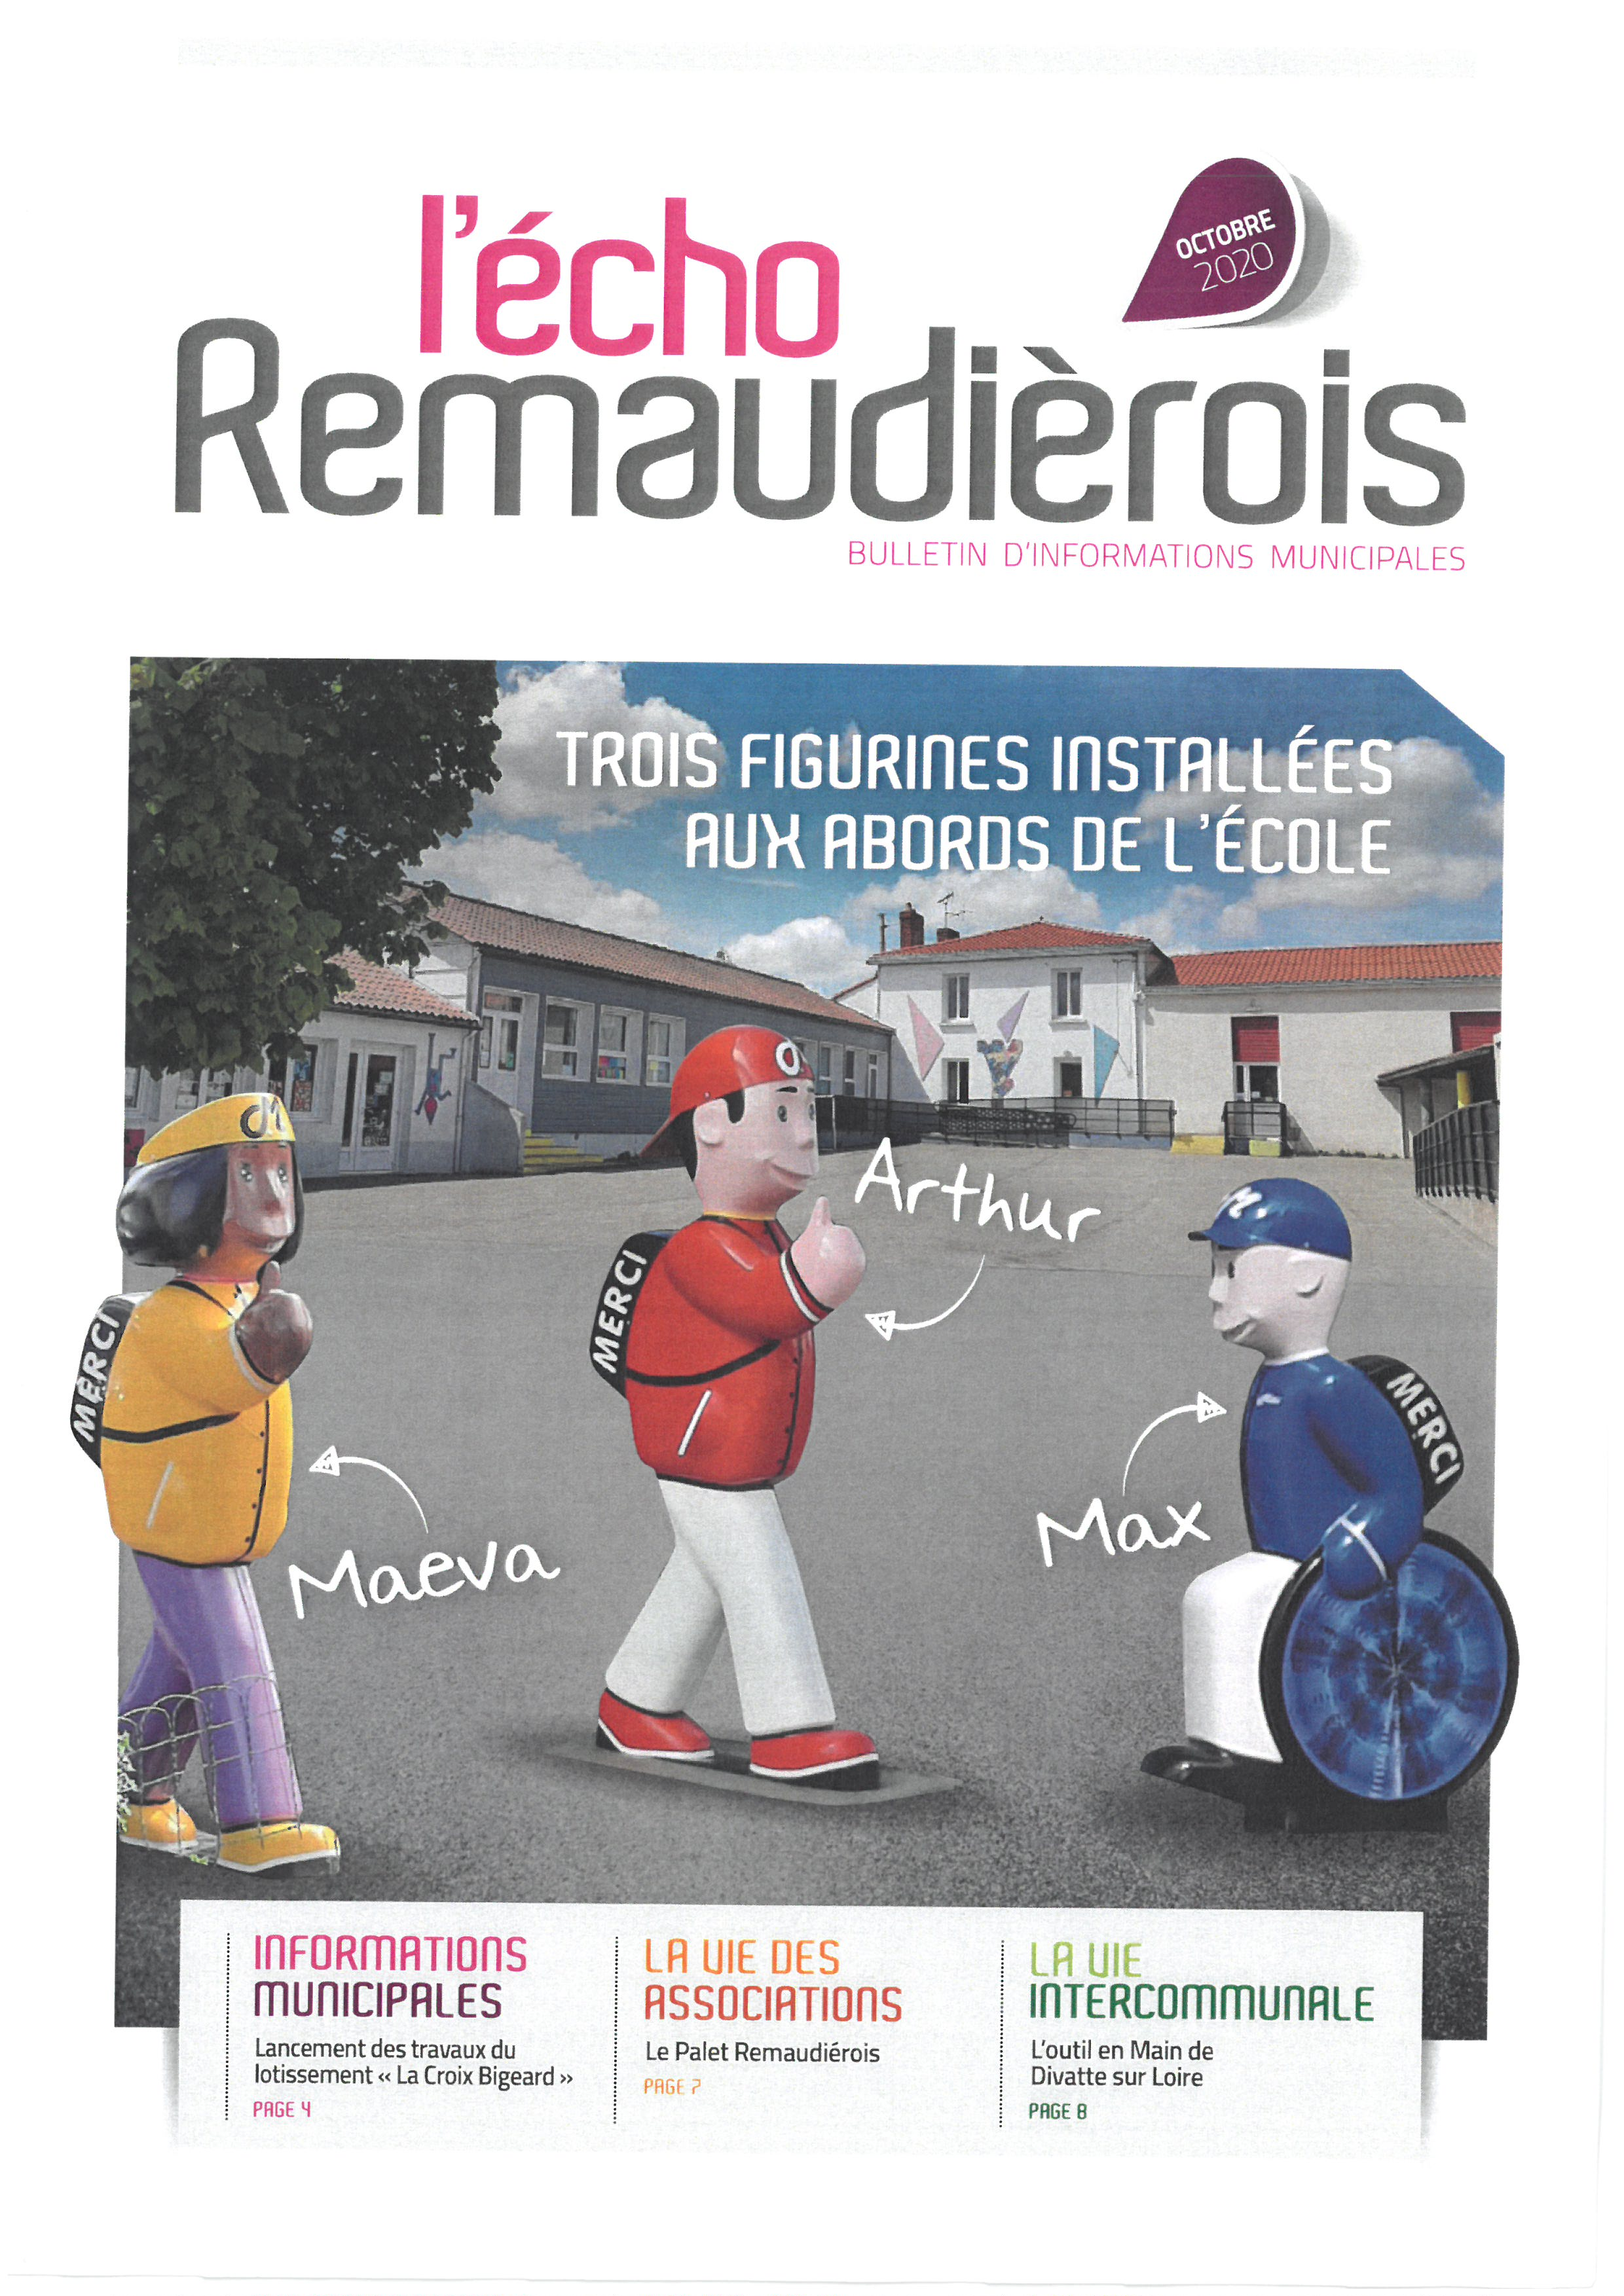 SMAIRIE LA 20092312231.jpg